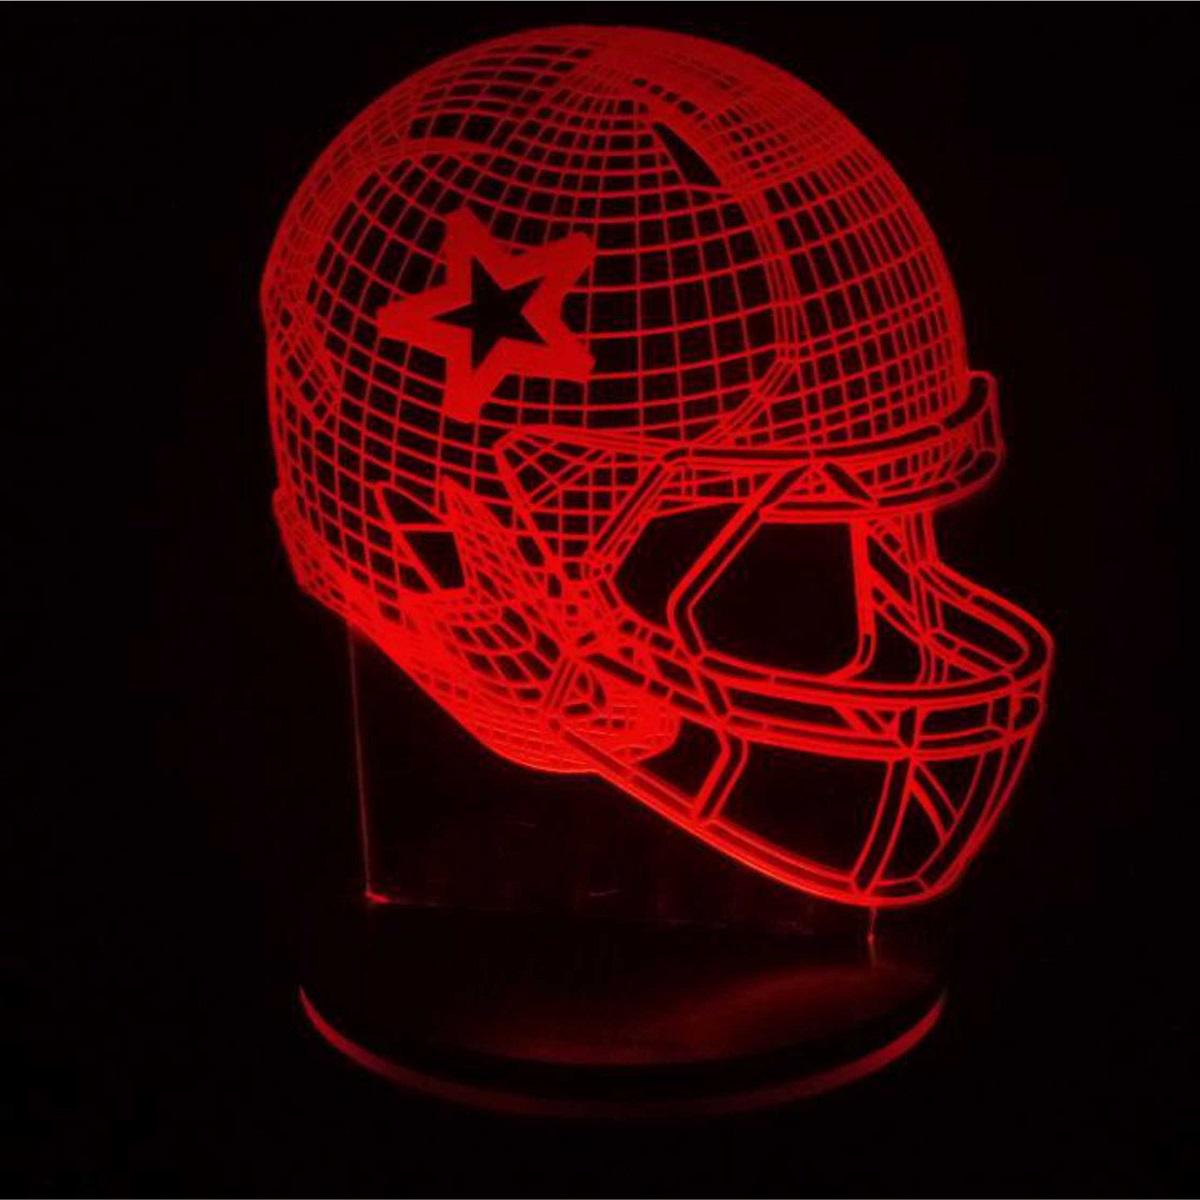 چراغ خواب سه بعدی پارسافن لیزر طرح کلاه راگبی 16 رنگ ریموت دار